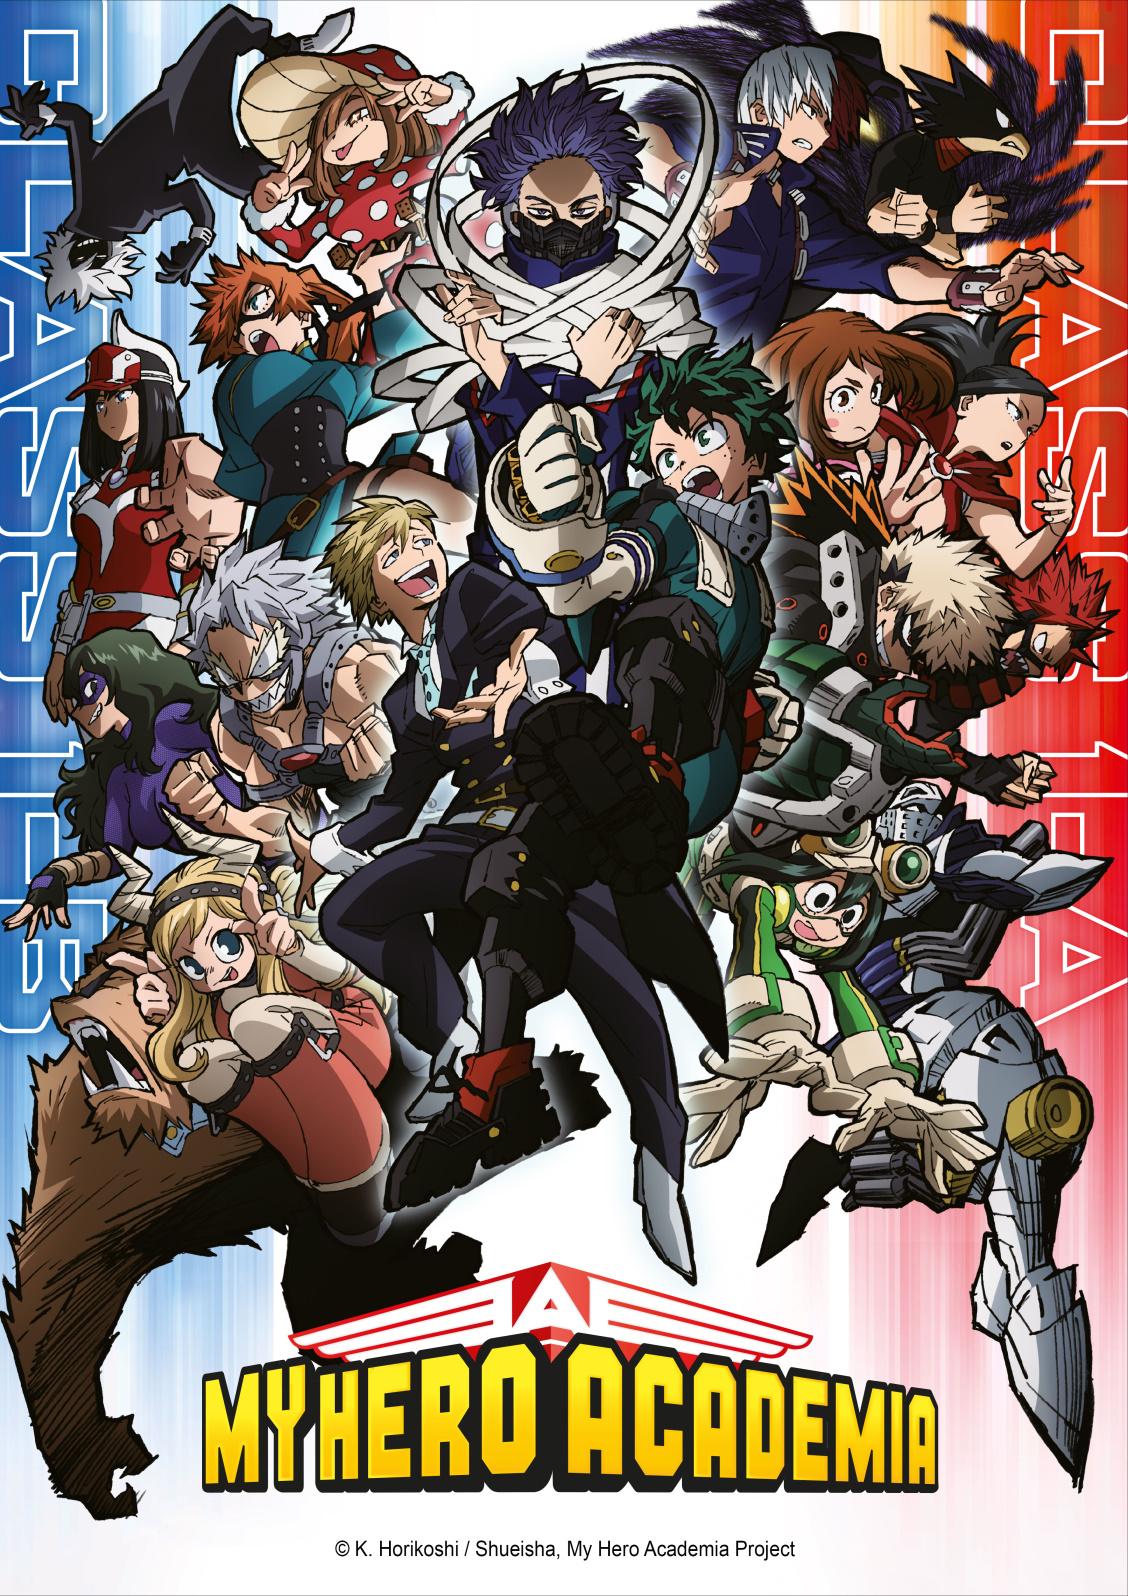 Assistir Boku no Hero Academia 5 HD Online Legendado, My Hero Academia 5 Legendado Online HD, Download Boku no Hero Academia 5 Todos Episódios HD Legendado, 僕のヒーローアカデミア Online.